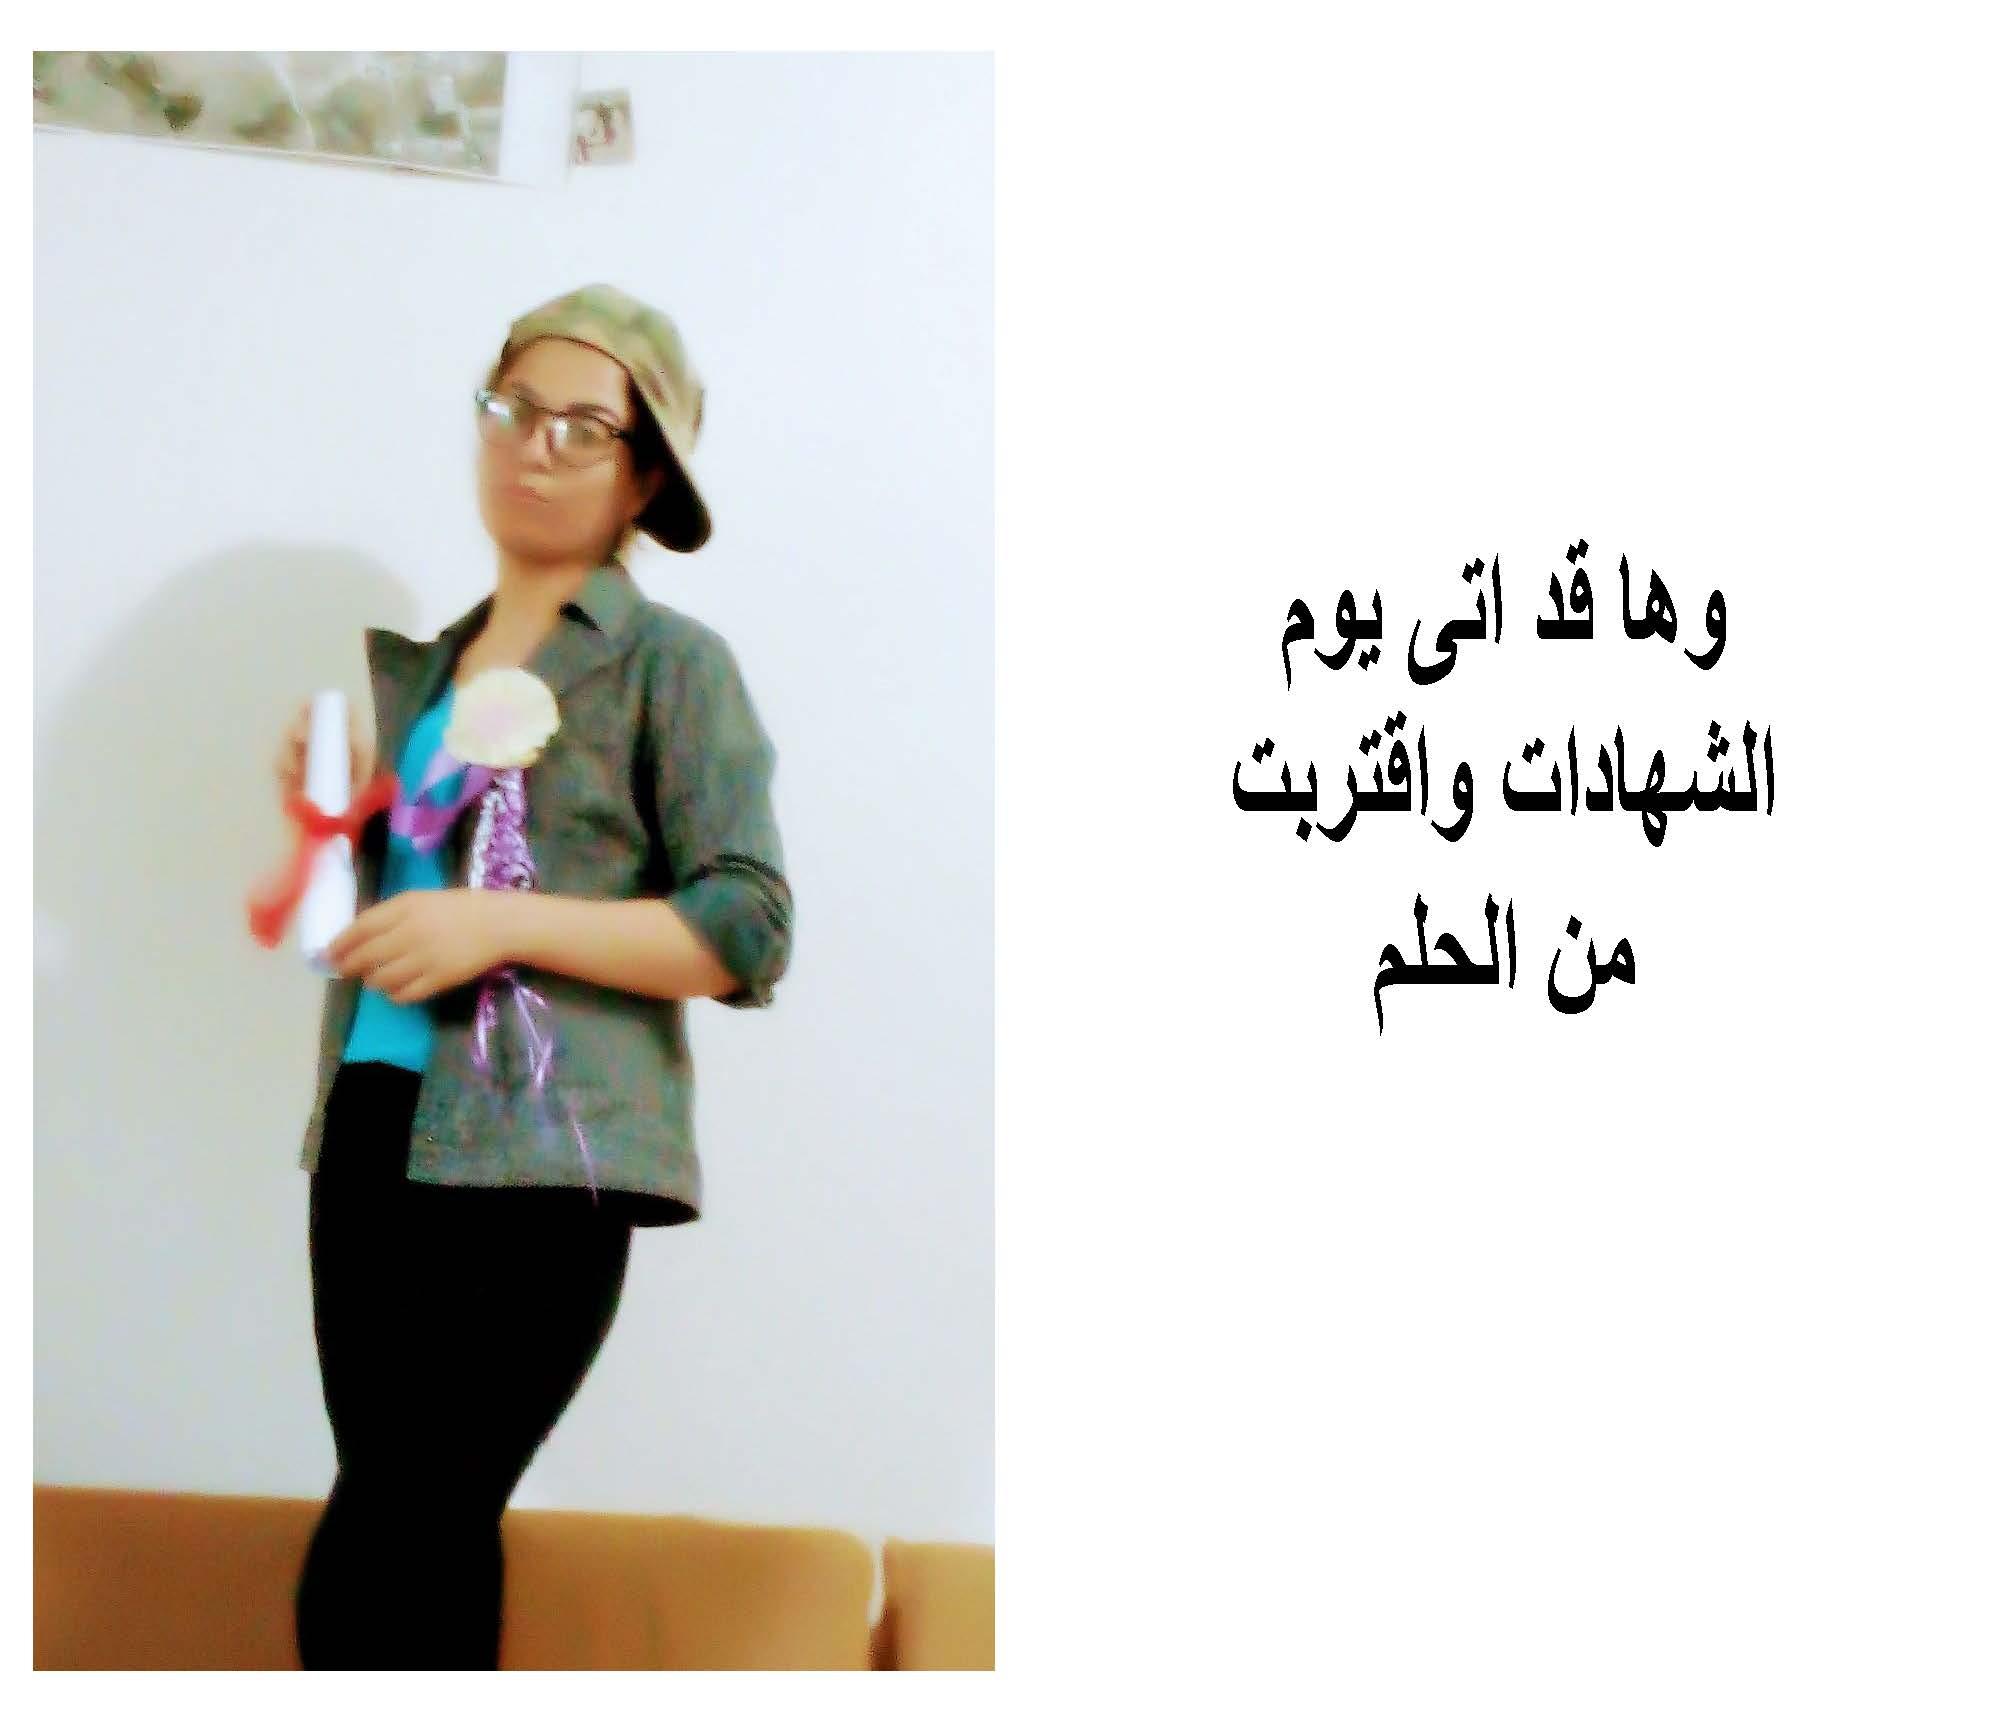 maria_Page_7.jpg